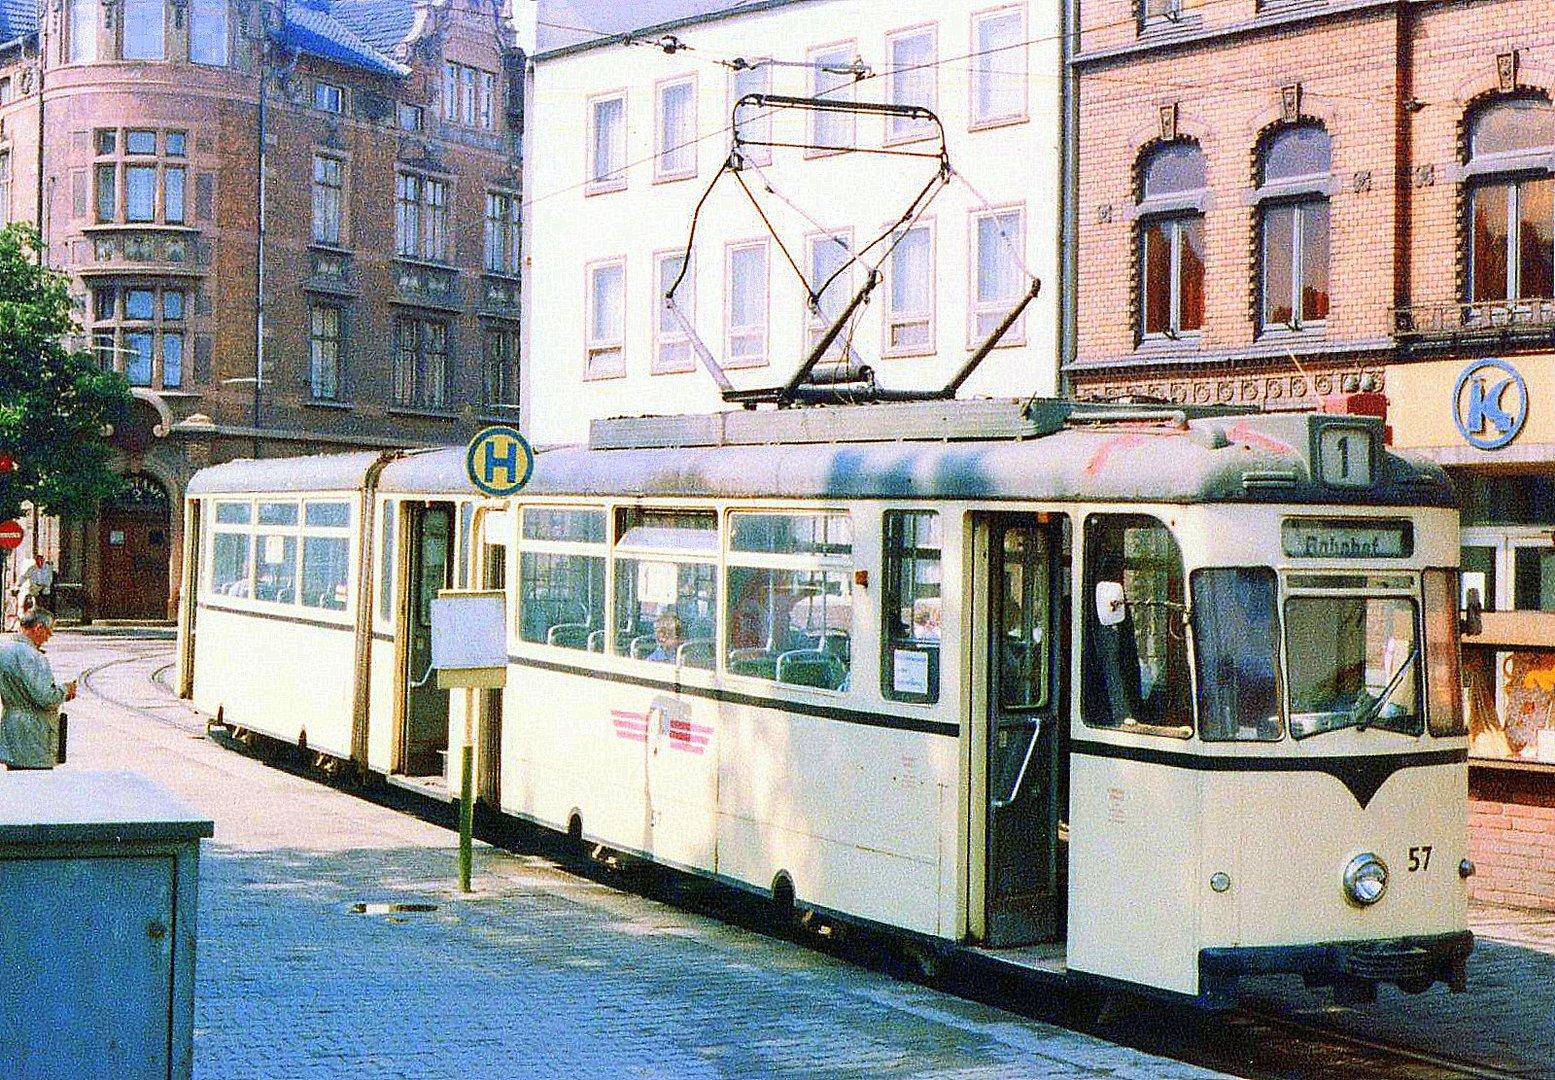 Nordhausen 57 am Bahnhof 1986